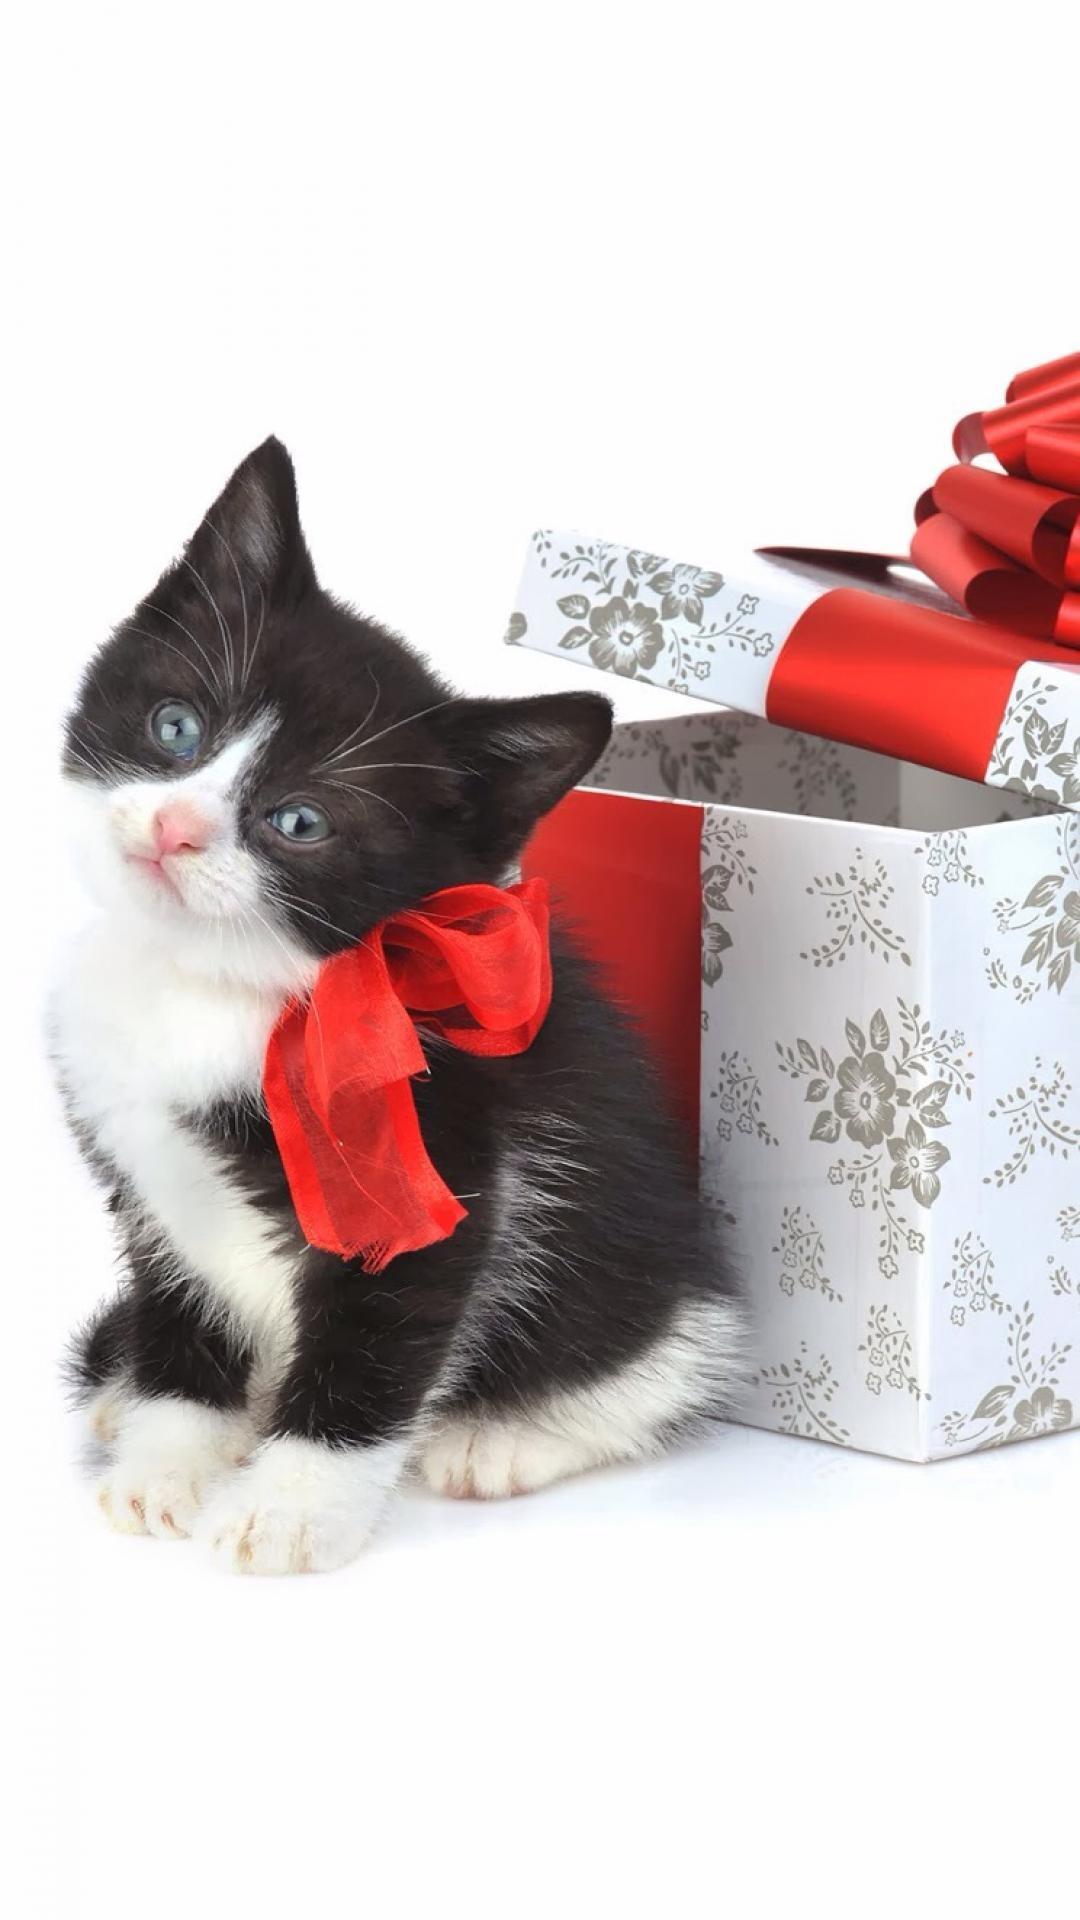 Christmas Kitten Present iPhone 6 wallpaper